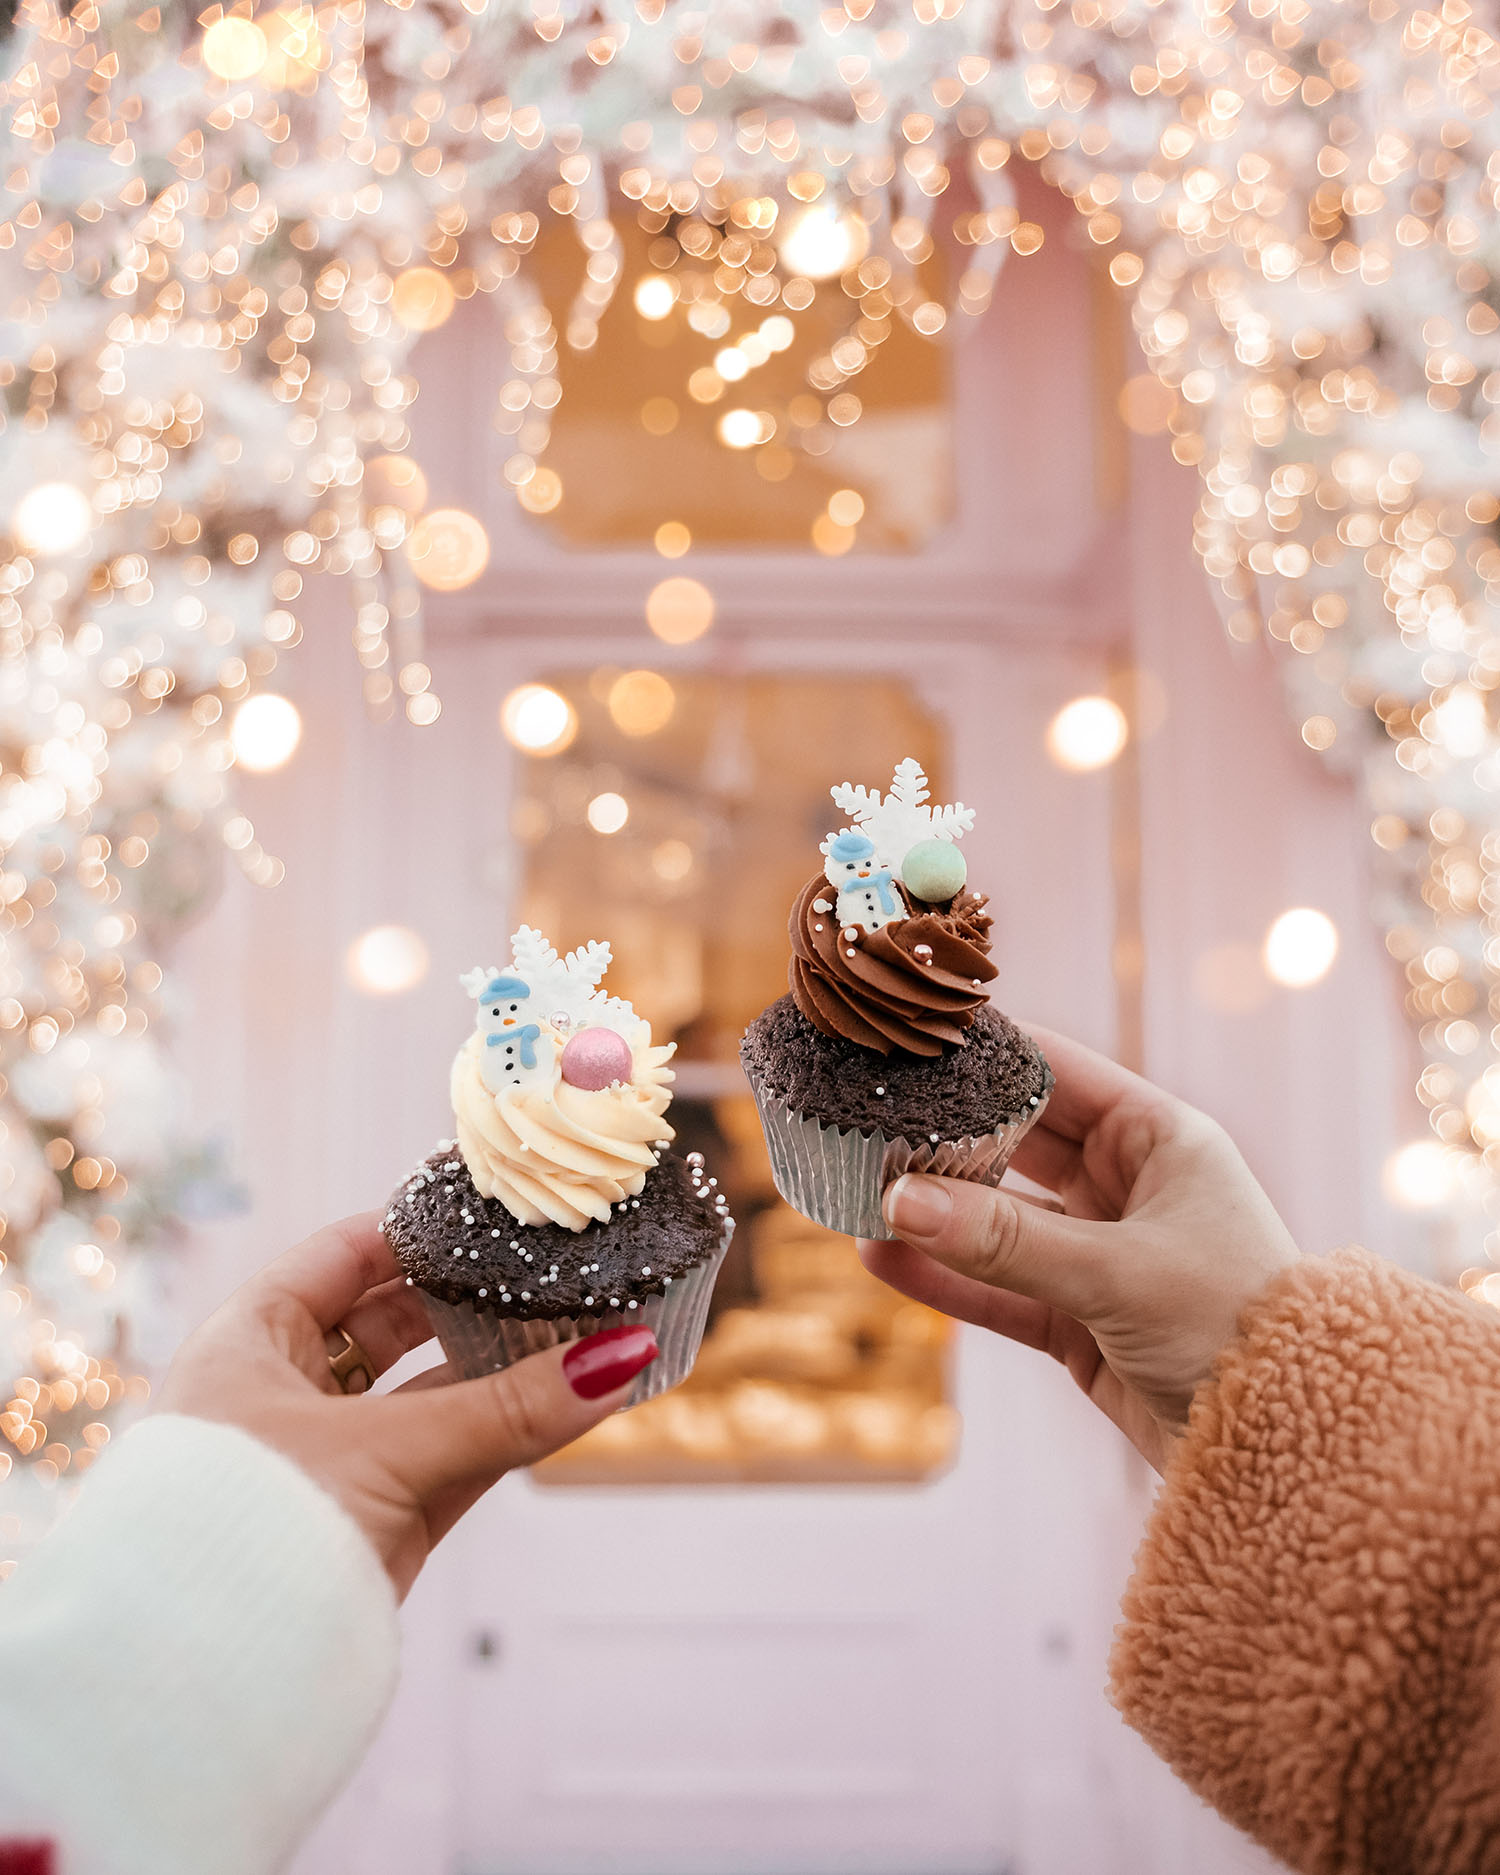 Peggy Porschen Cakes, London |Instagrammable desserts in London